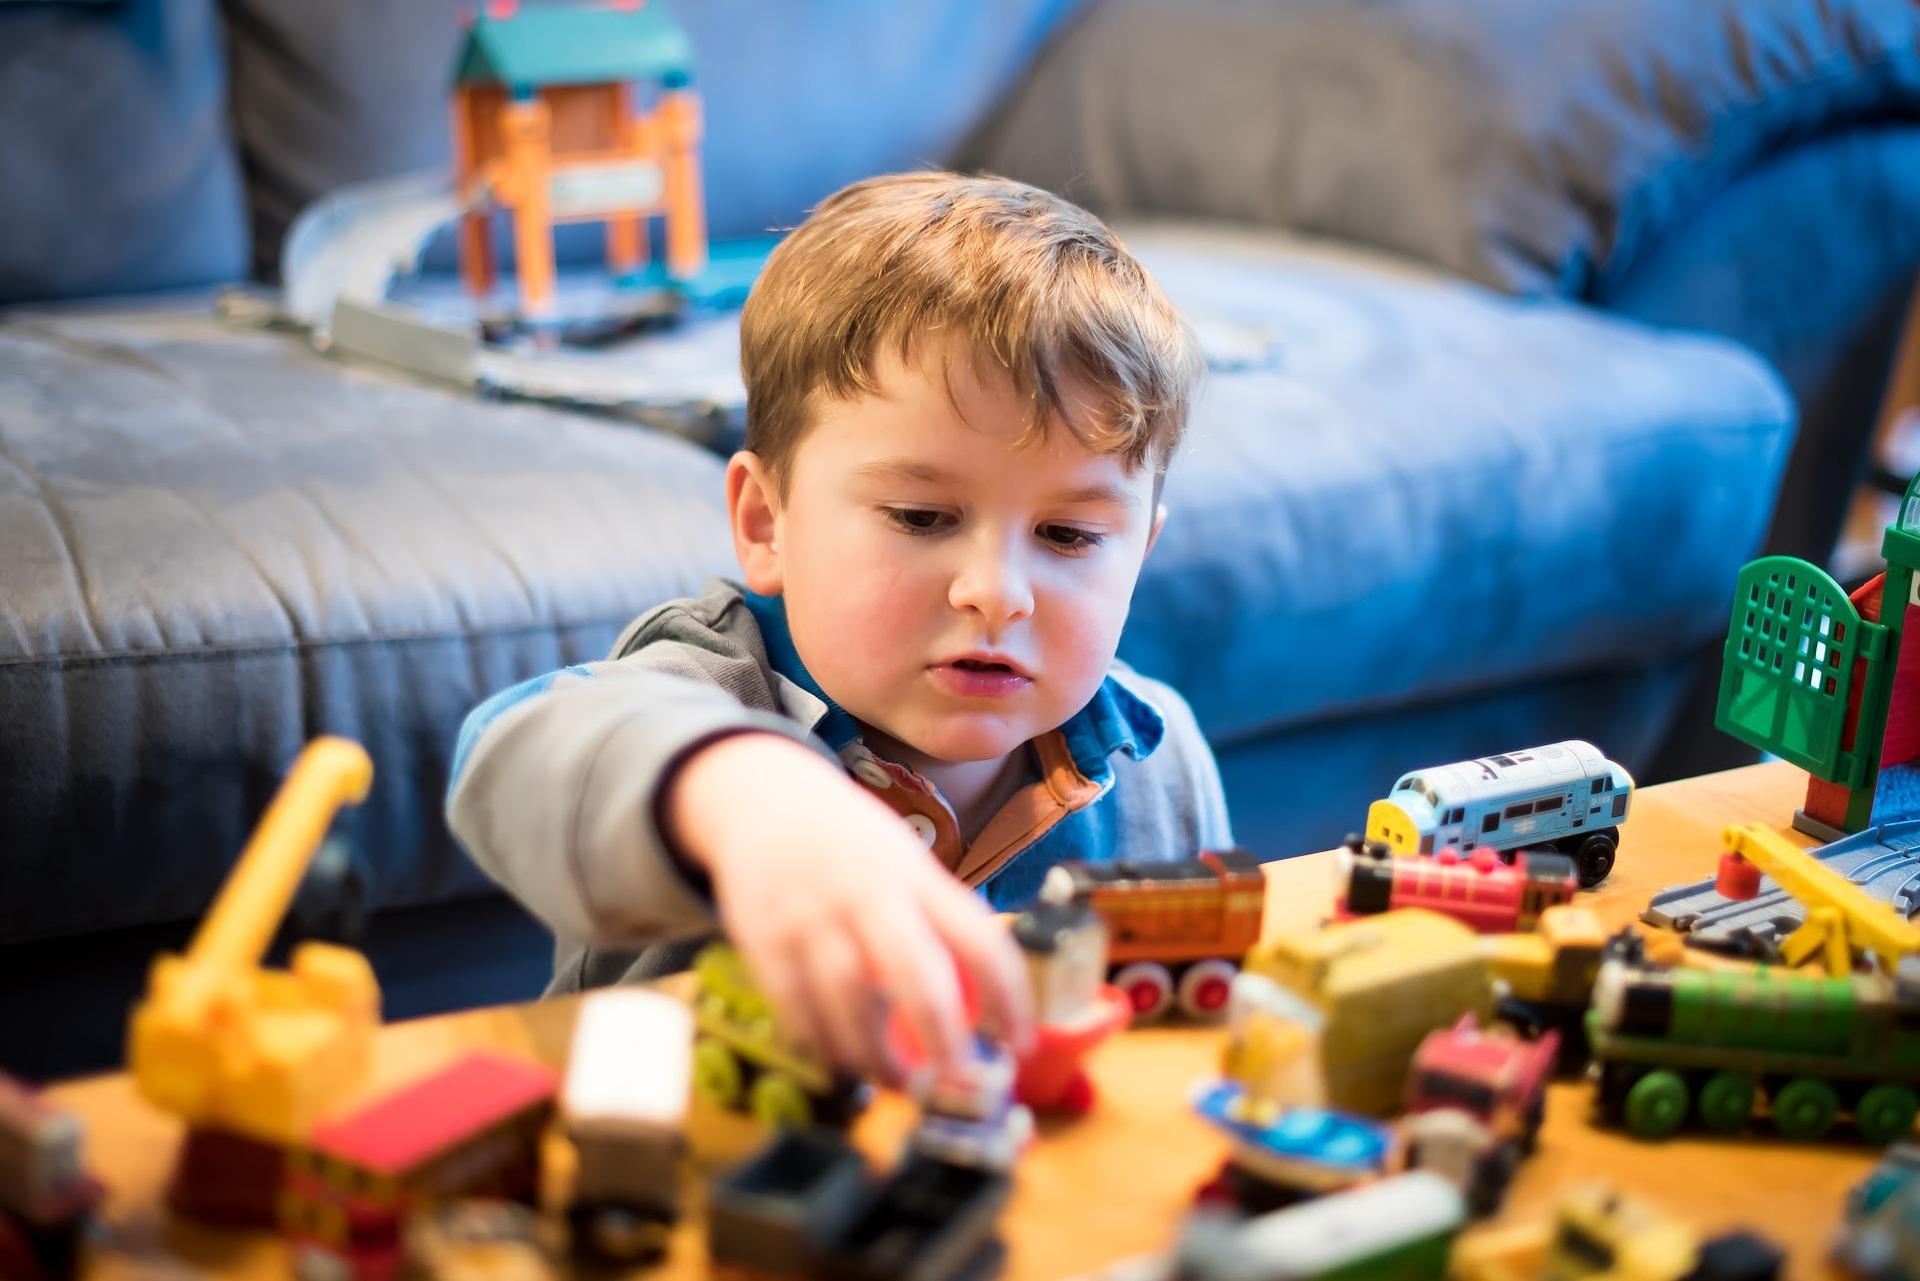 Best Websites to Buy Toys Online for Kids